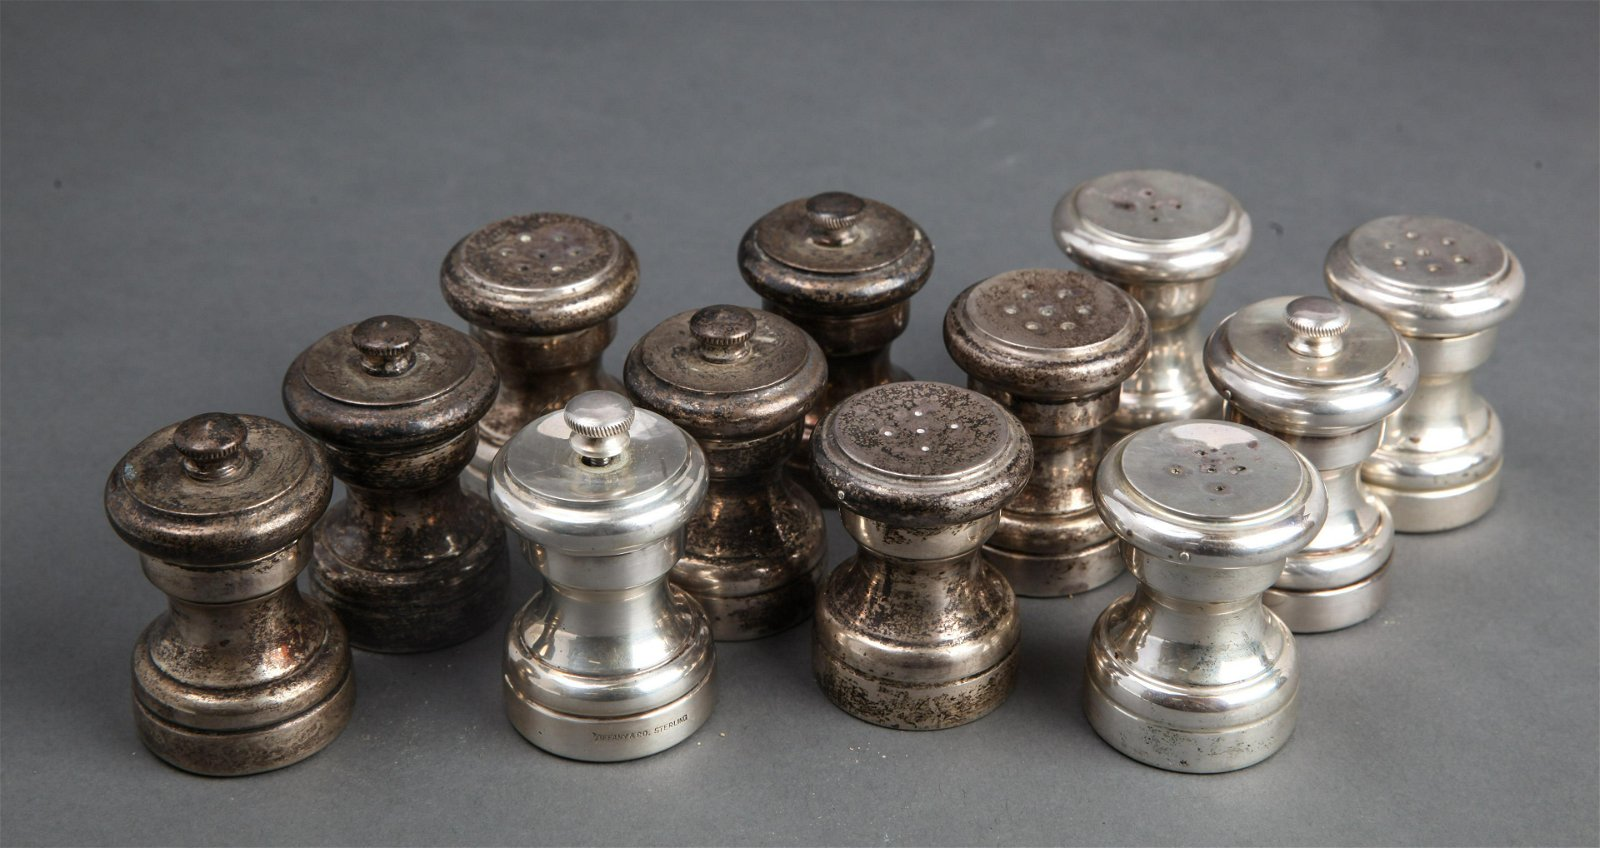 Tiffany & Co. Silver Salt & Pepper Shakers, 6